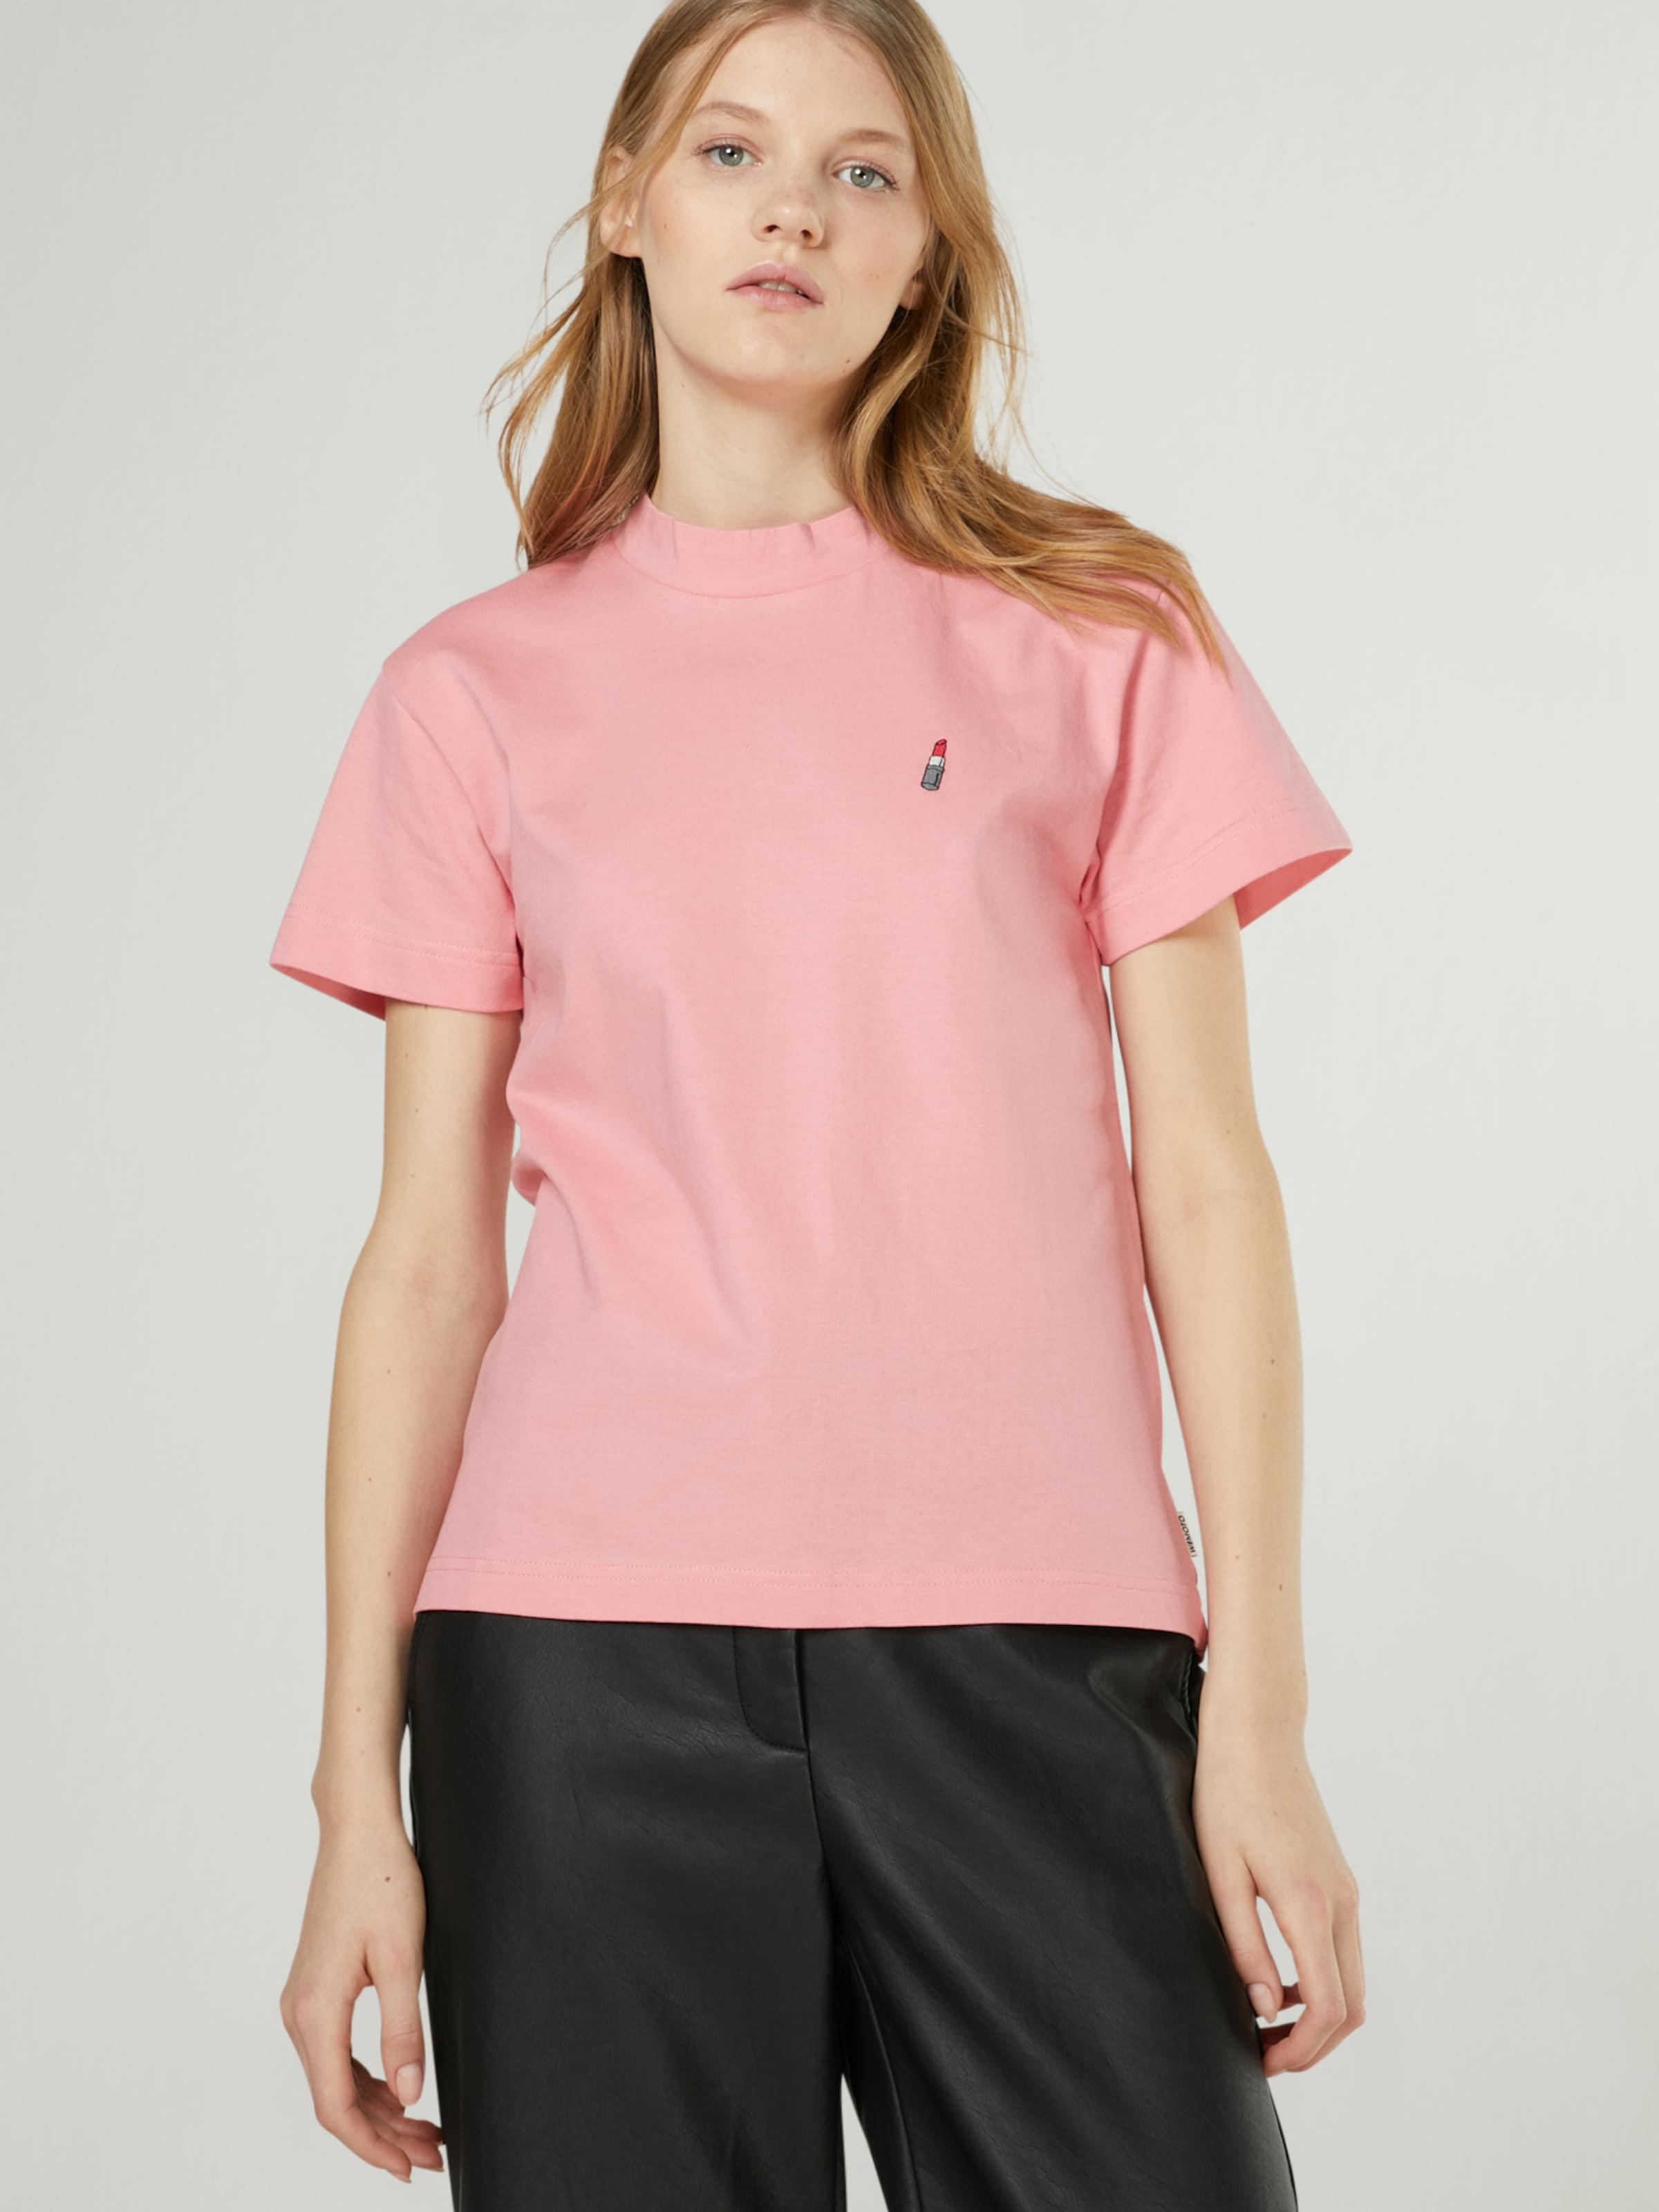 Wemoto T-Shirt 'Lipstick' Großhandelspreis Verkauf Online 4izwA